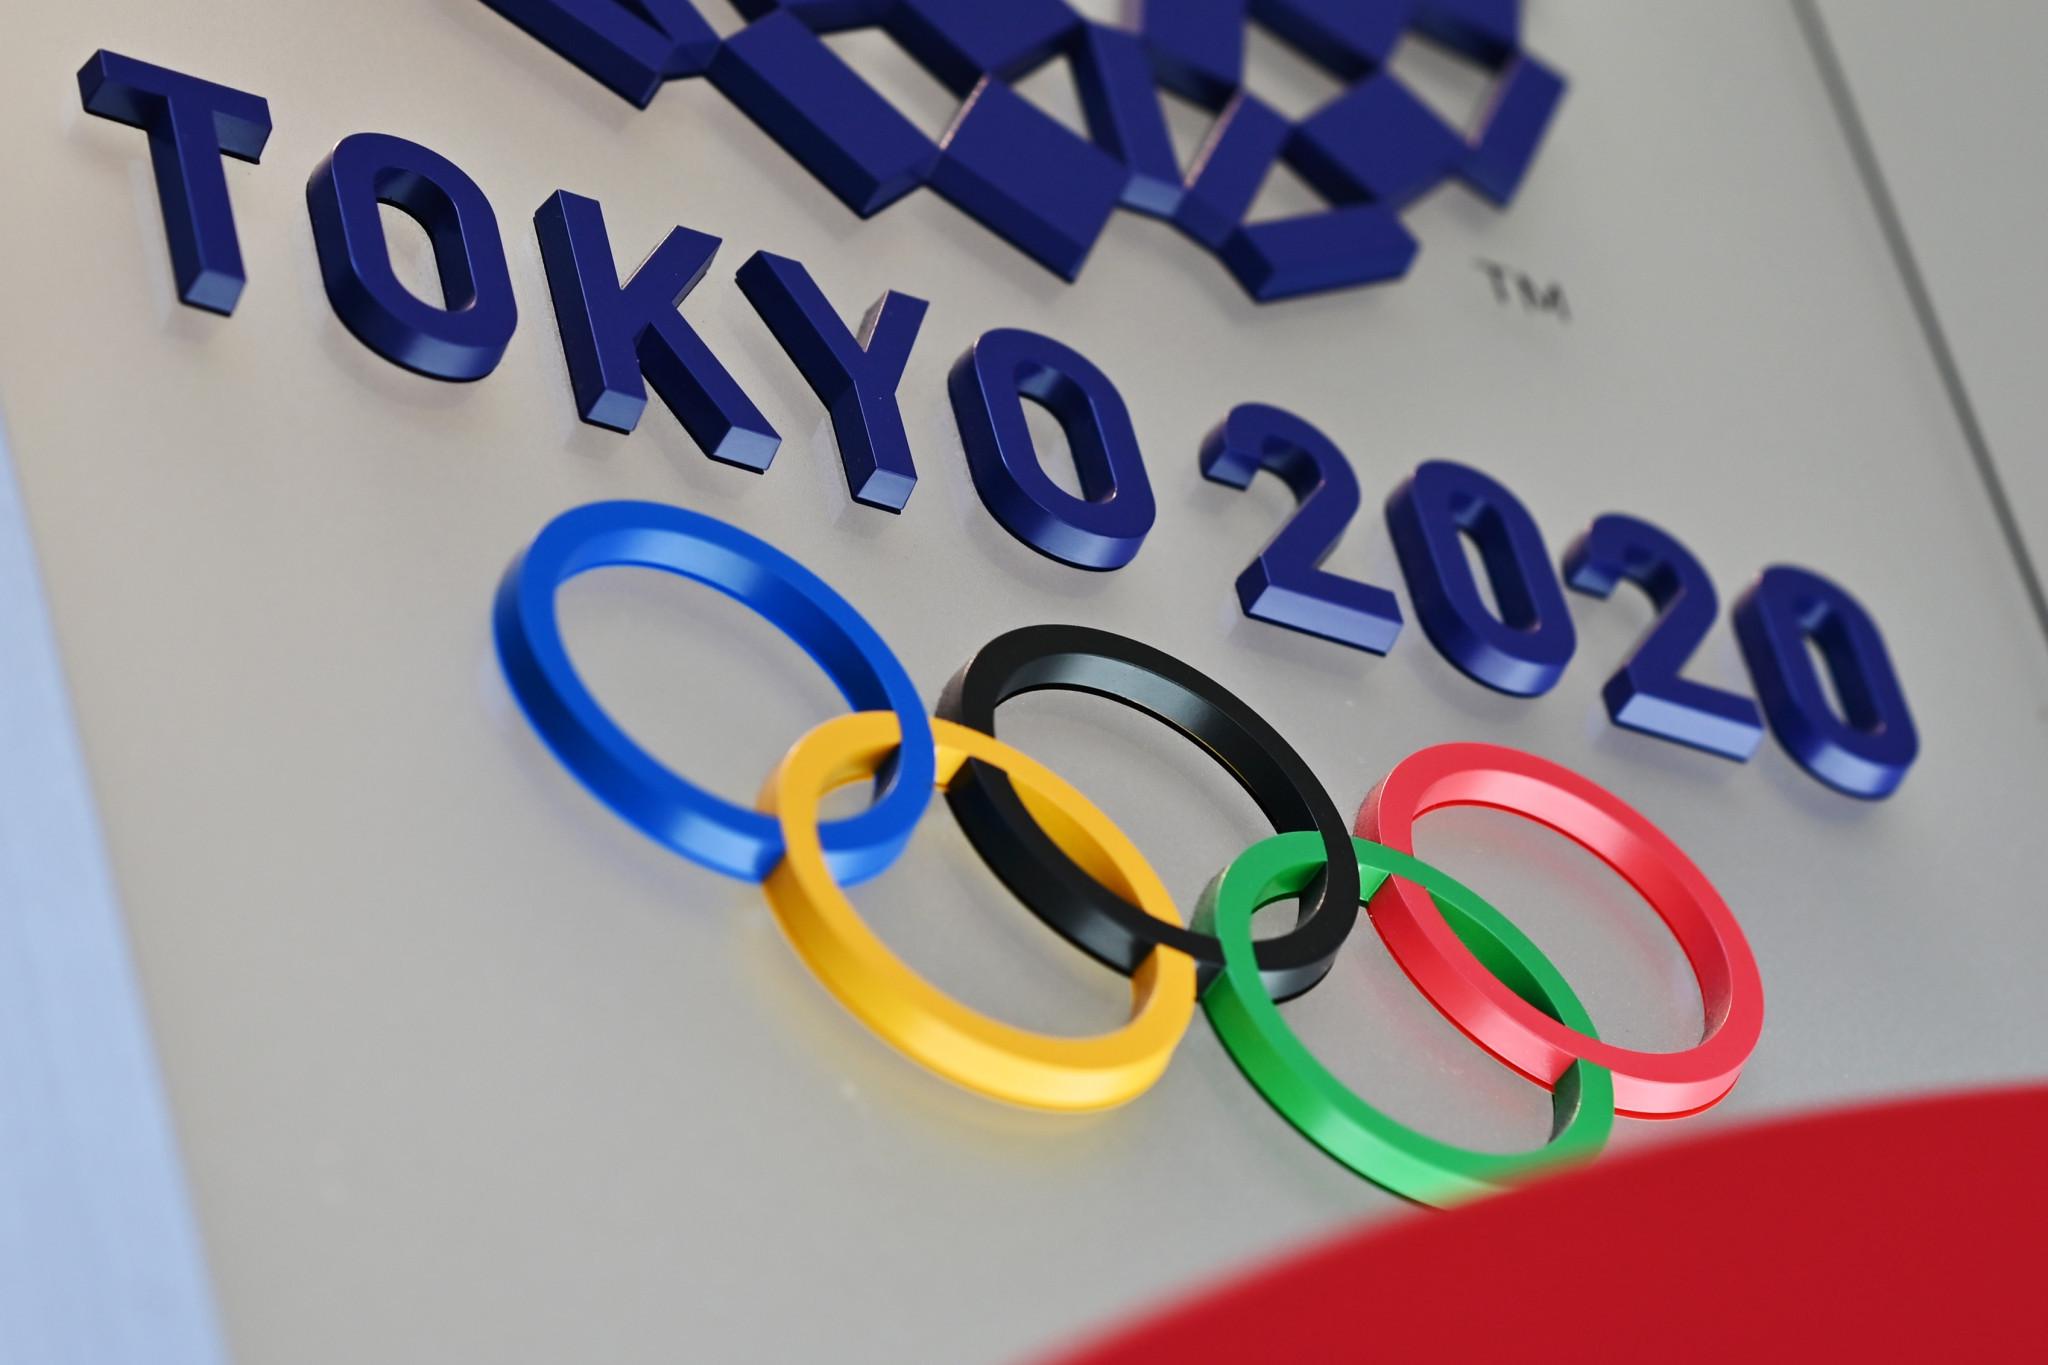 Indian Olympic Association's Tokyo 2020 visit postponed